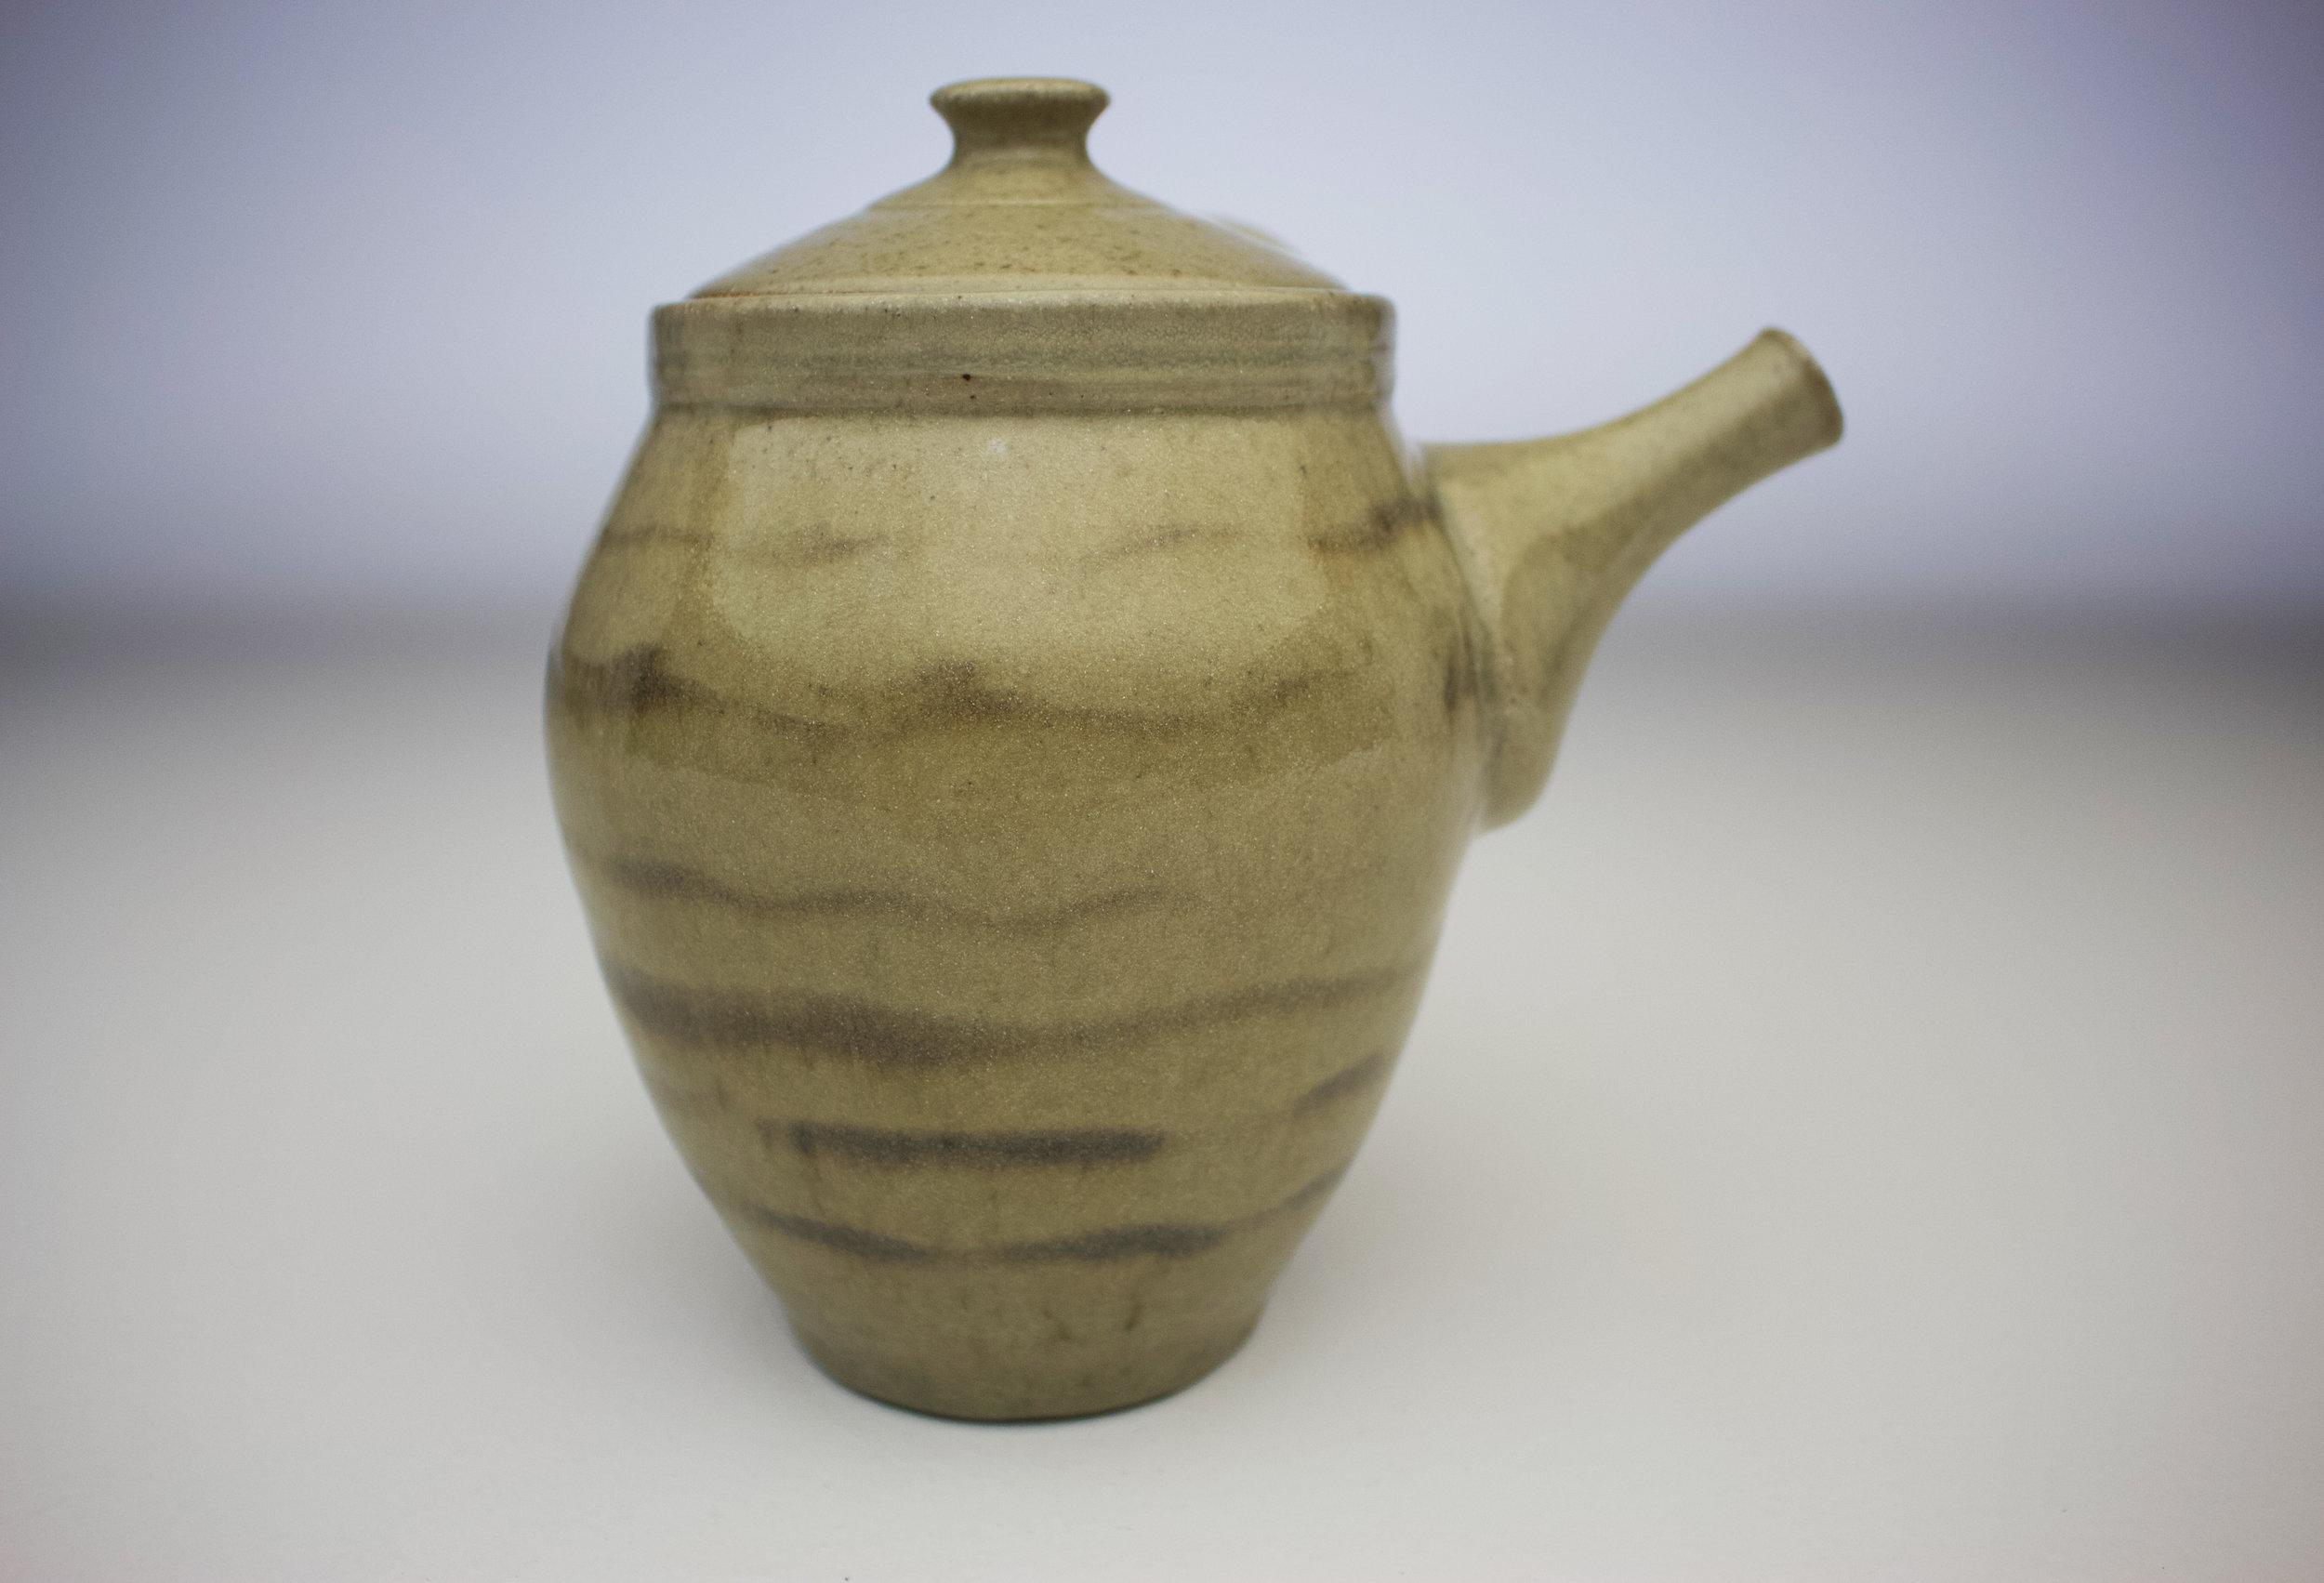 leach tiger striped tea pot 3.jpg